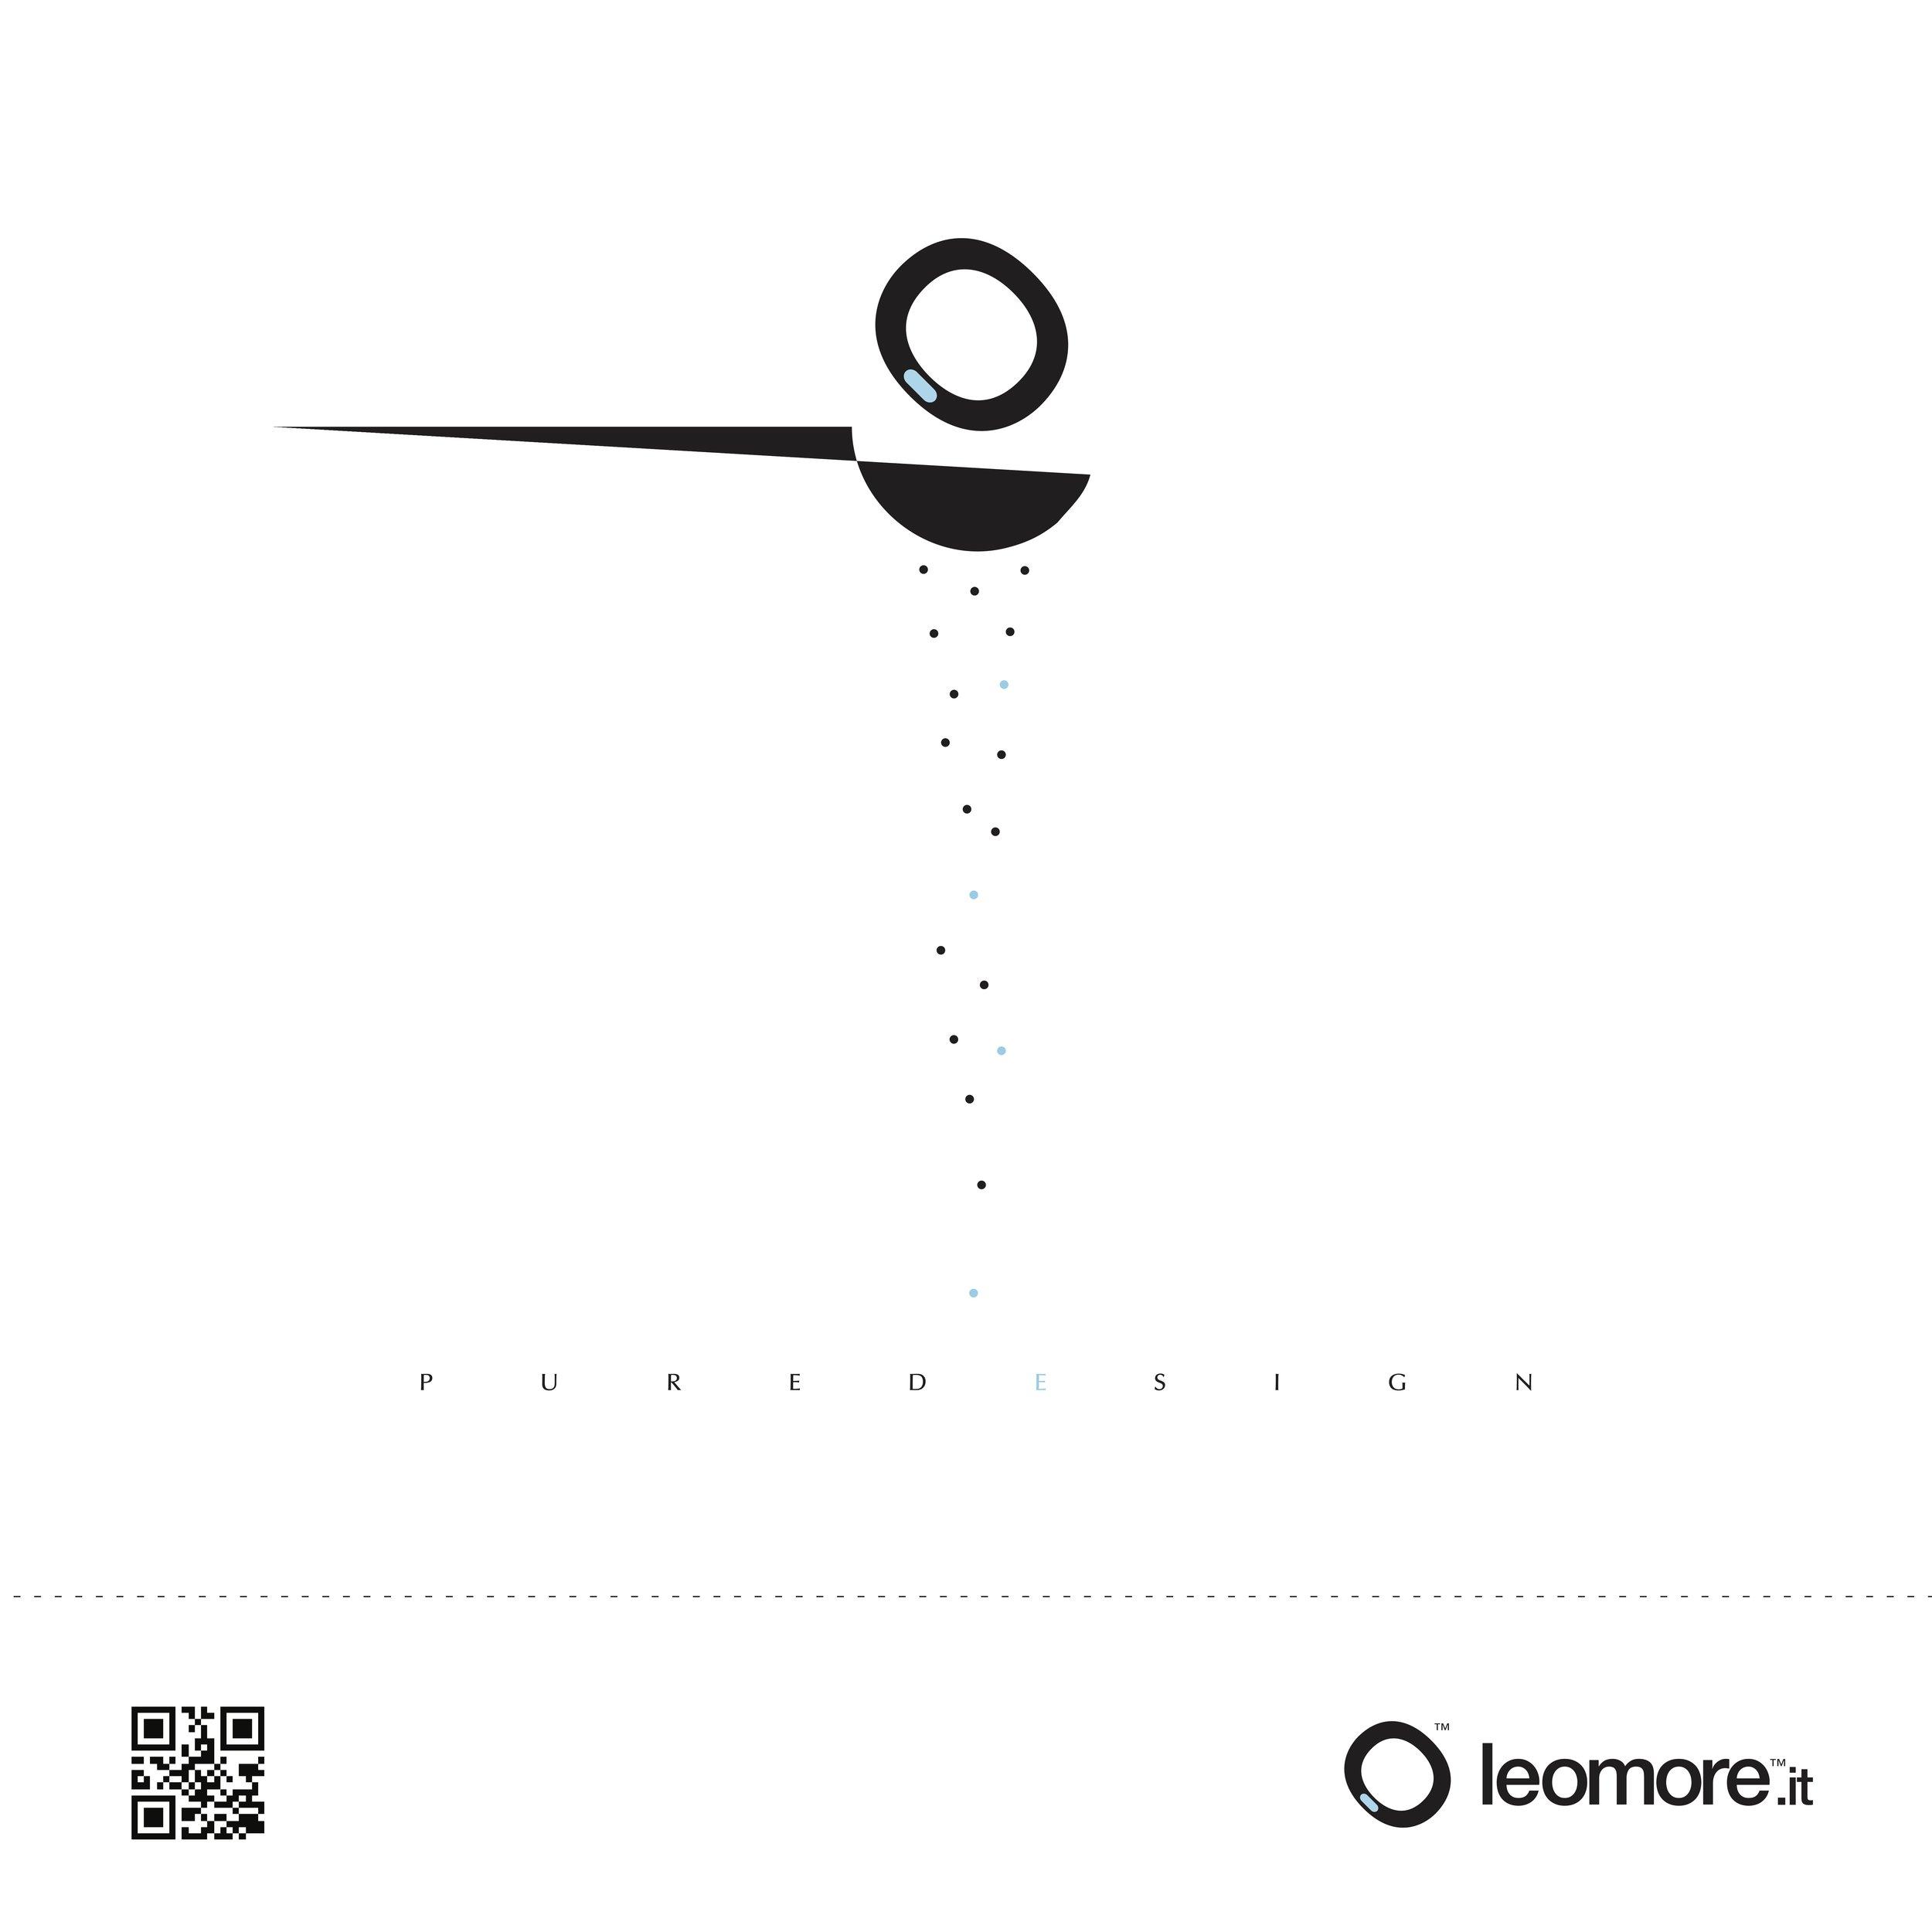 NEW_leomore_machine.jpg